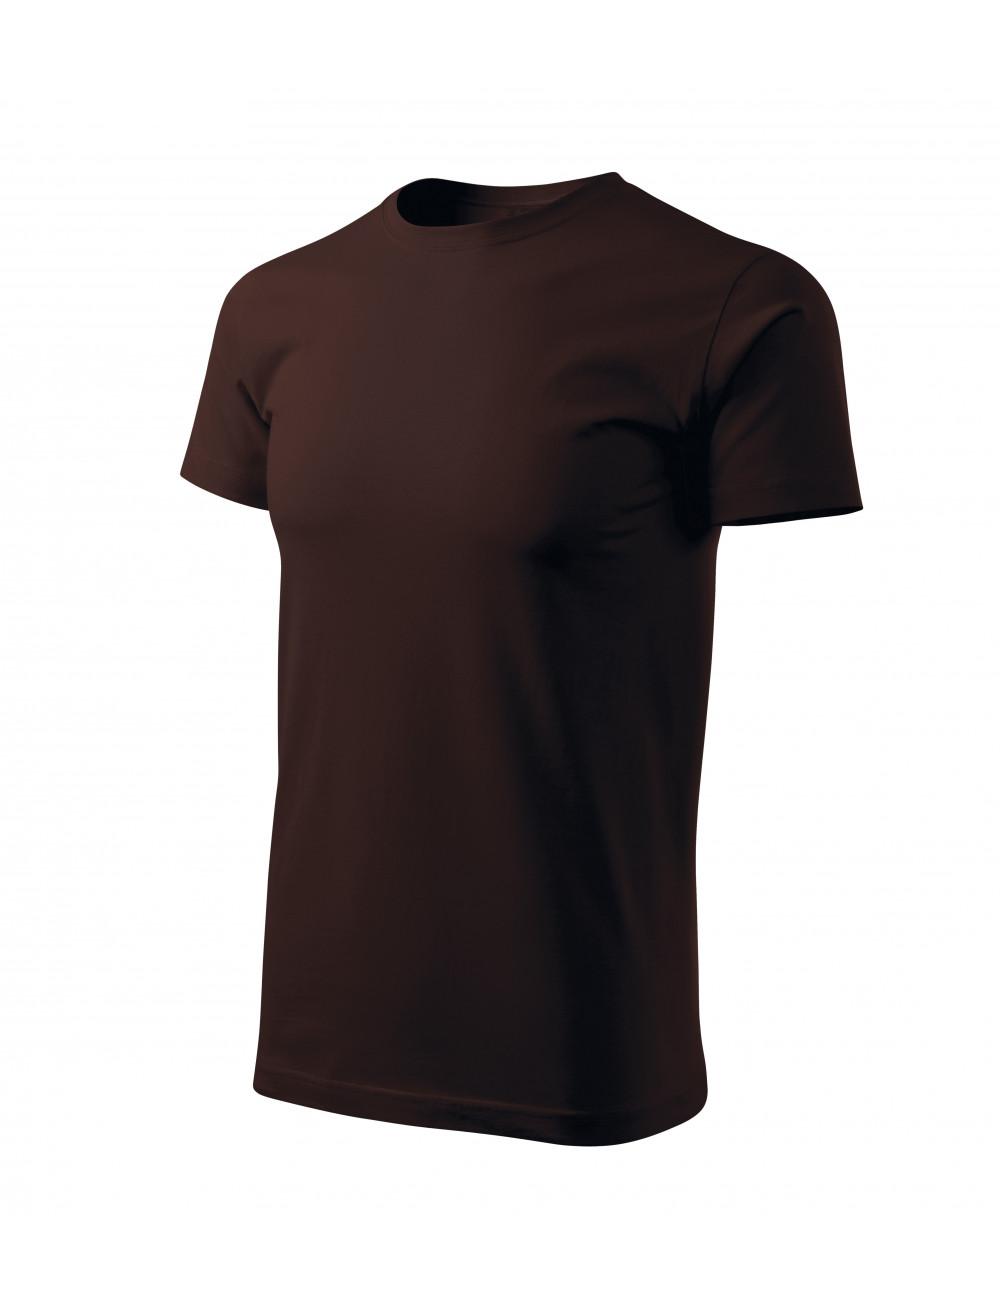 Adler MALFINI Koszulka męska Basic Free F29 kawowy